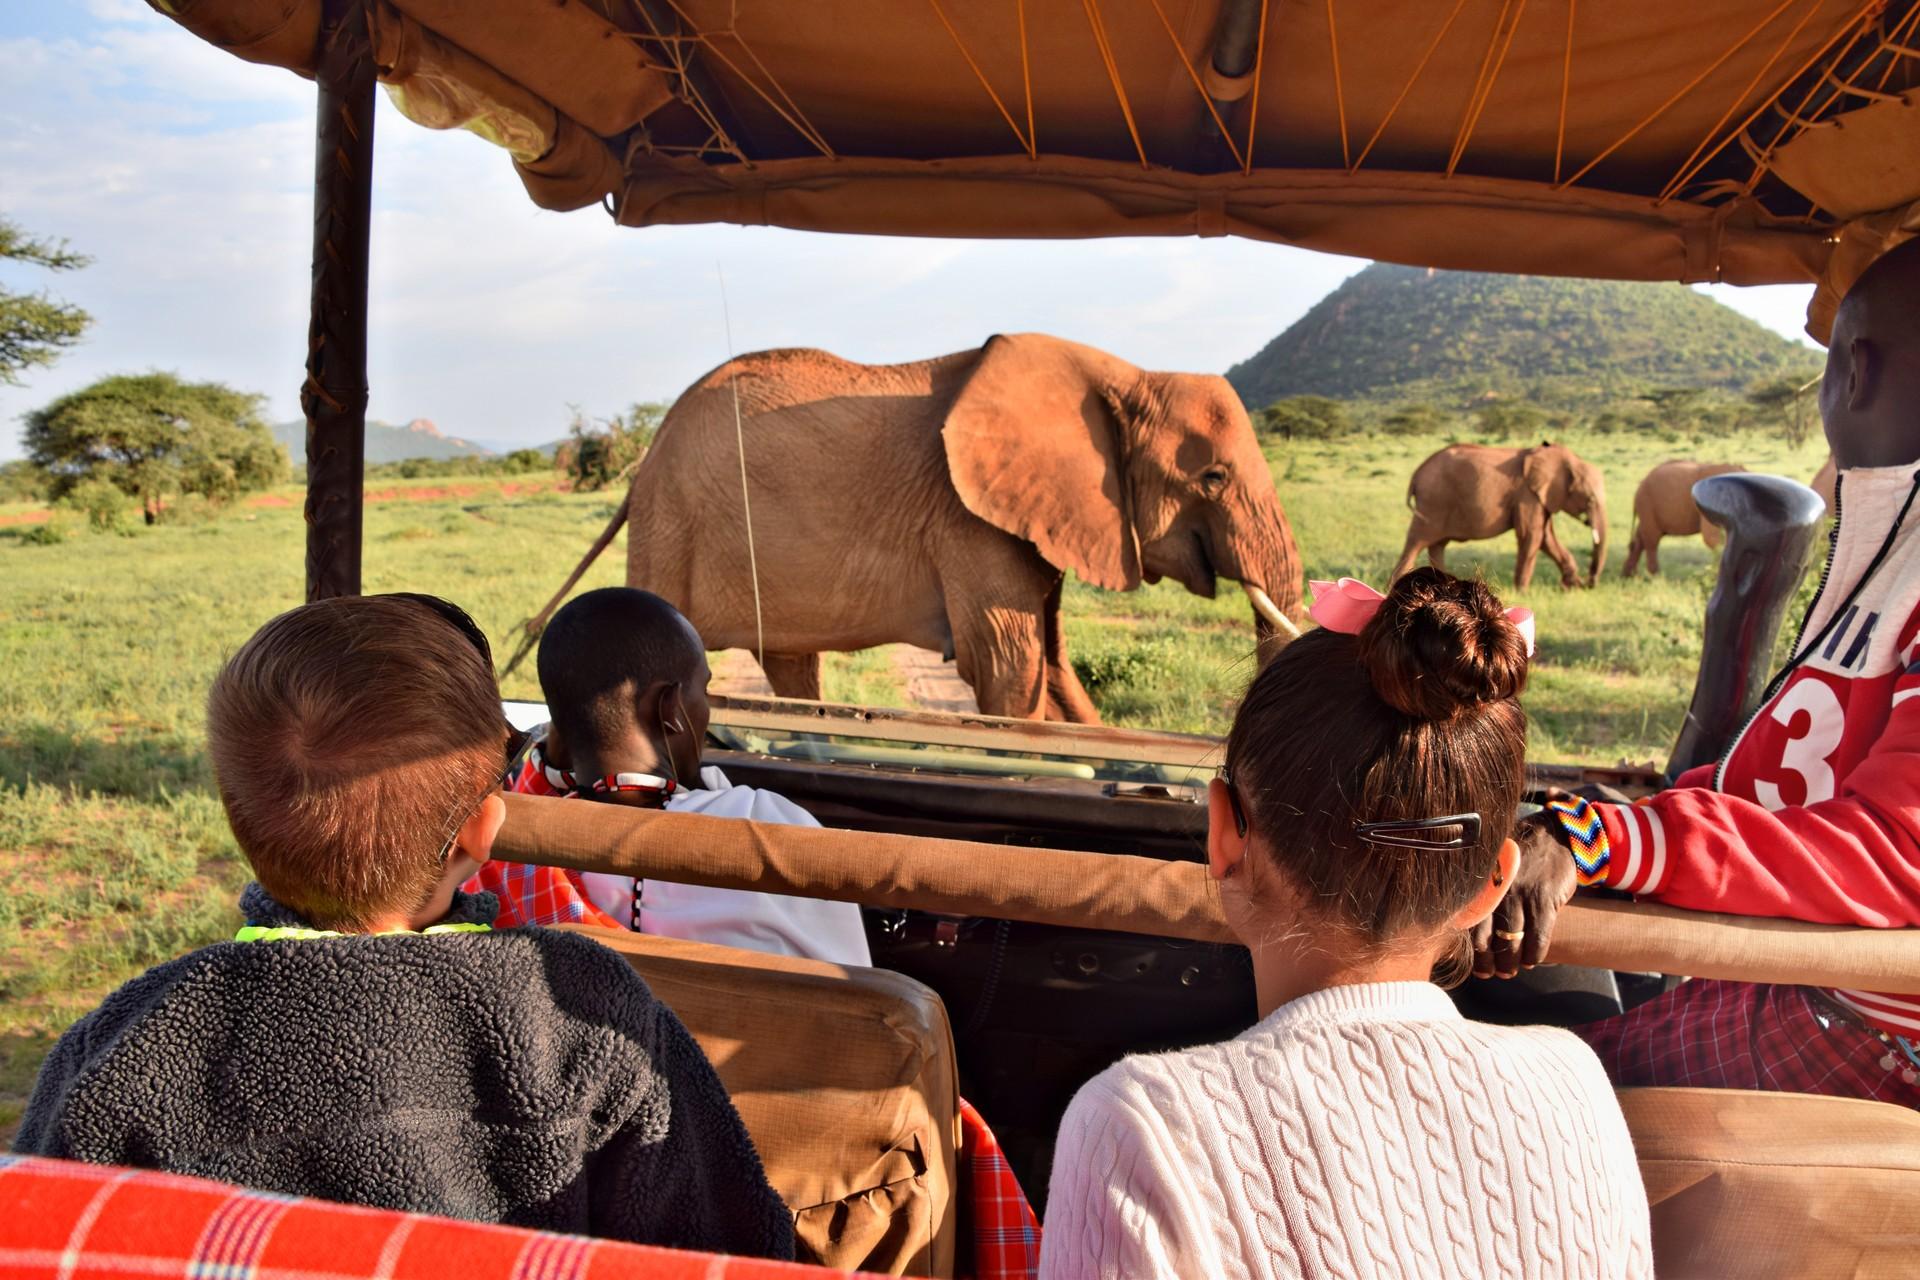 Children on safari in Kenya